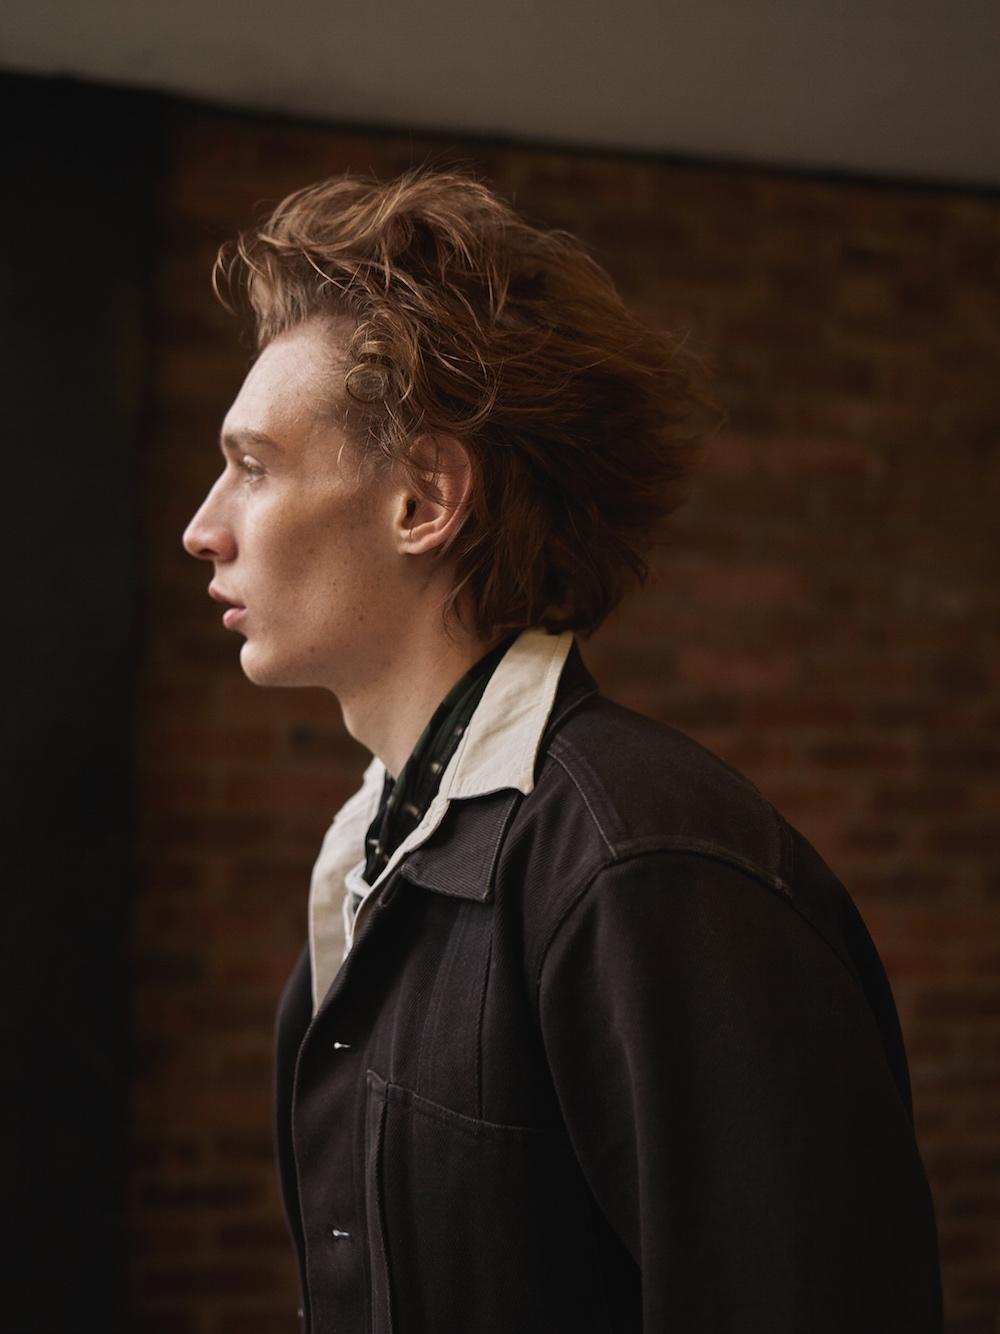 clement_jolin_fashion_photographer_mens_london_fields_unravel_productions_007.jpg